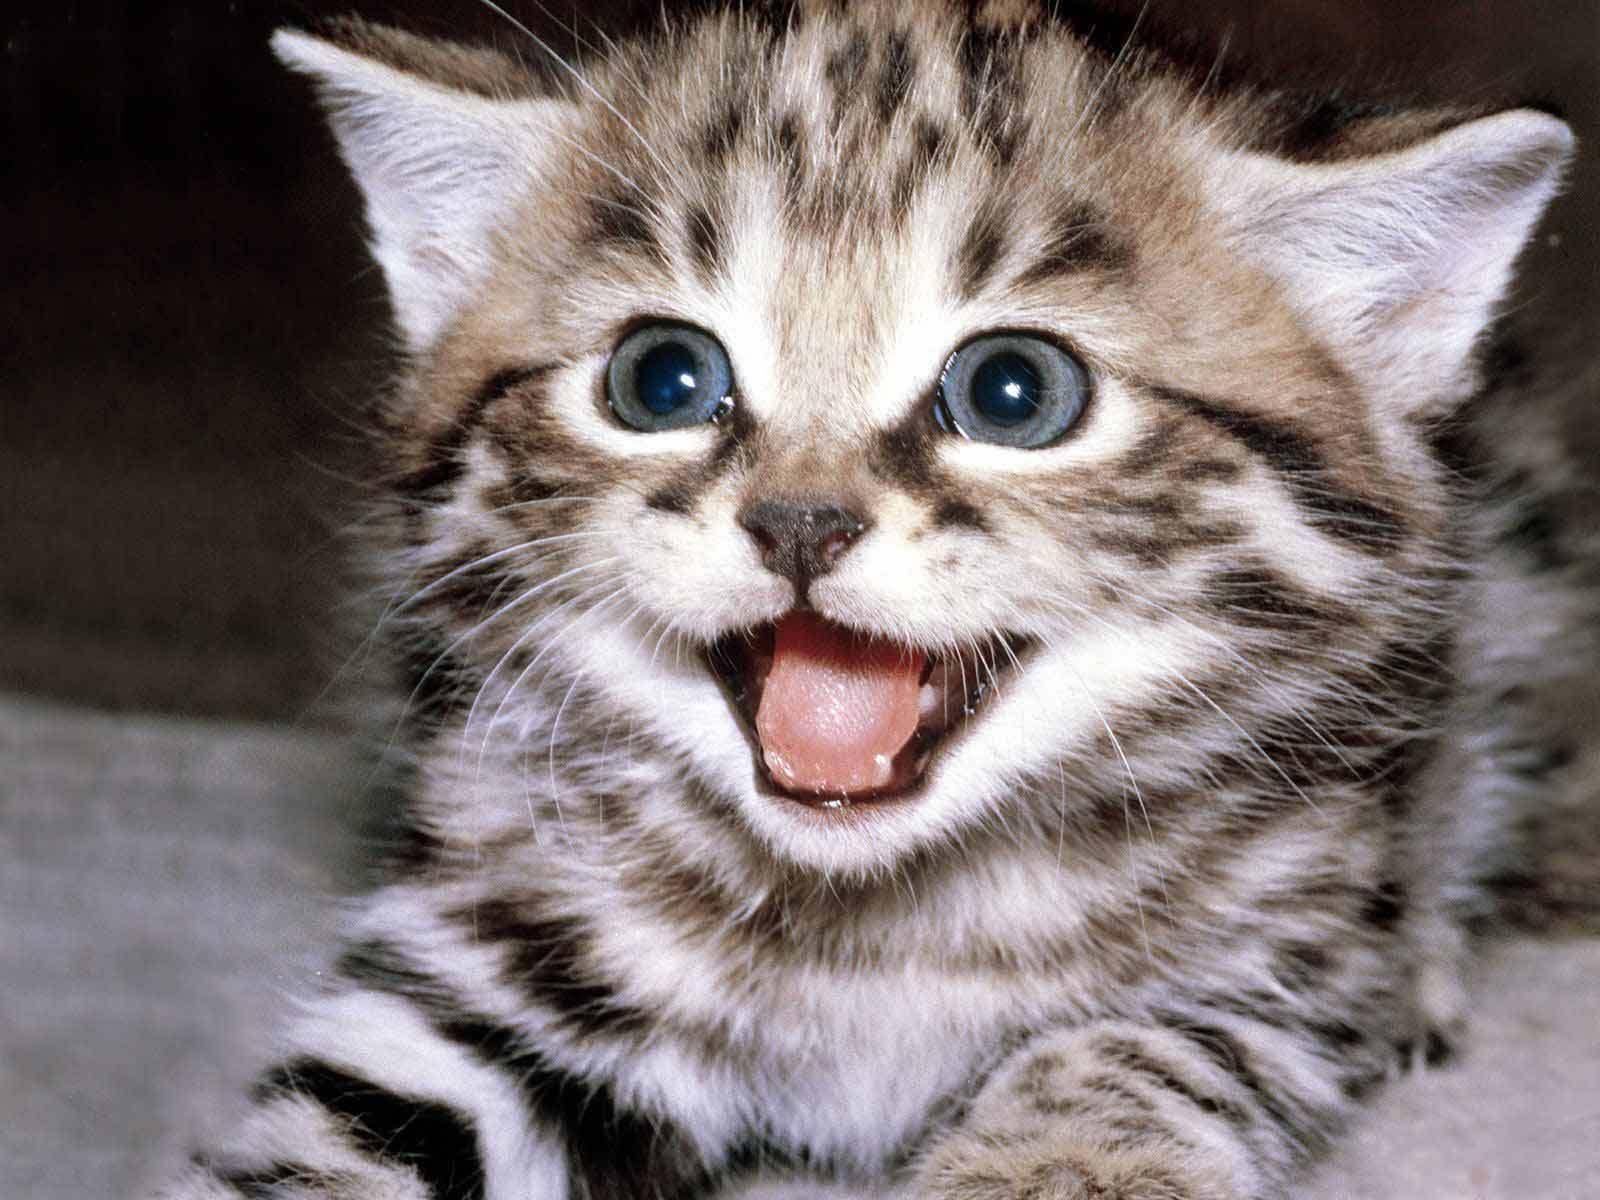 [Image: happy-kitten-kittens-5890512-1600-1200.jpg]